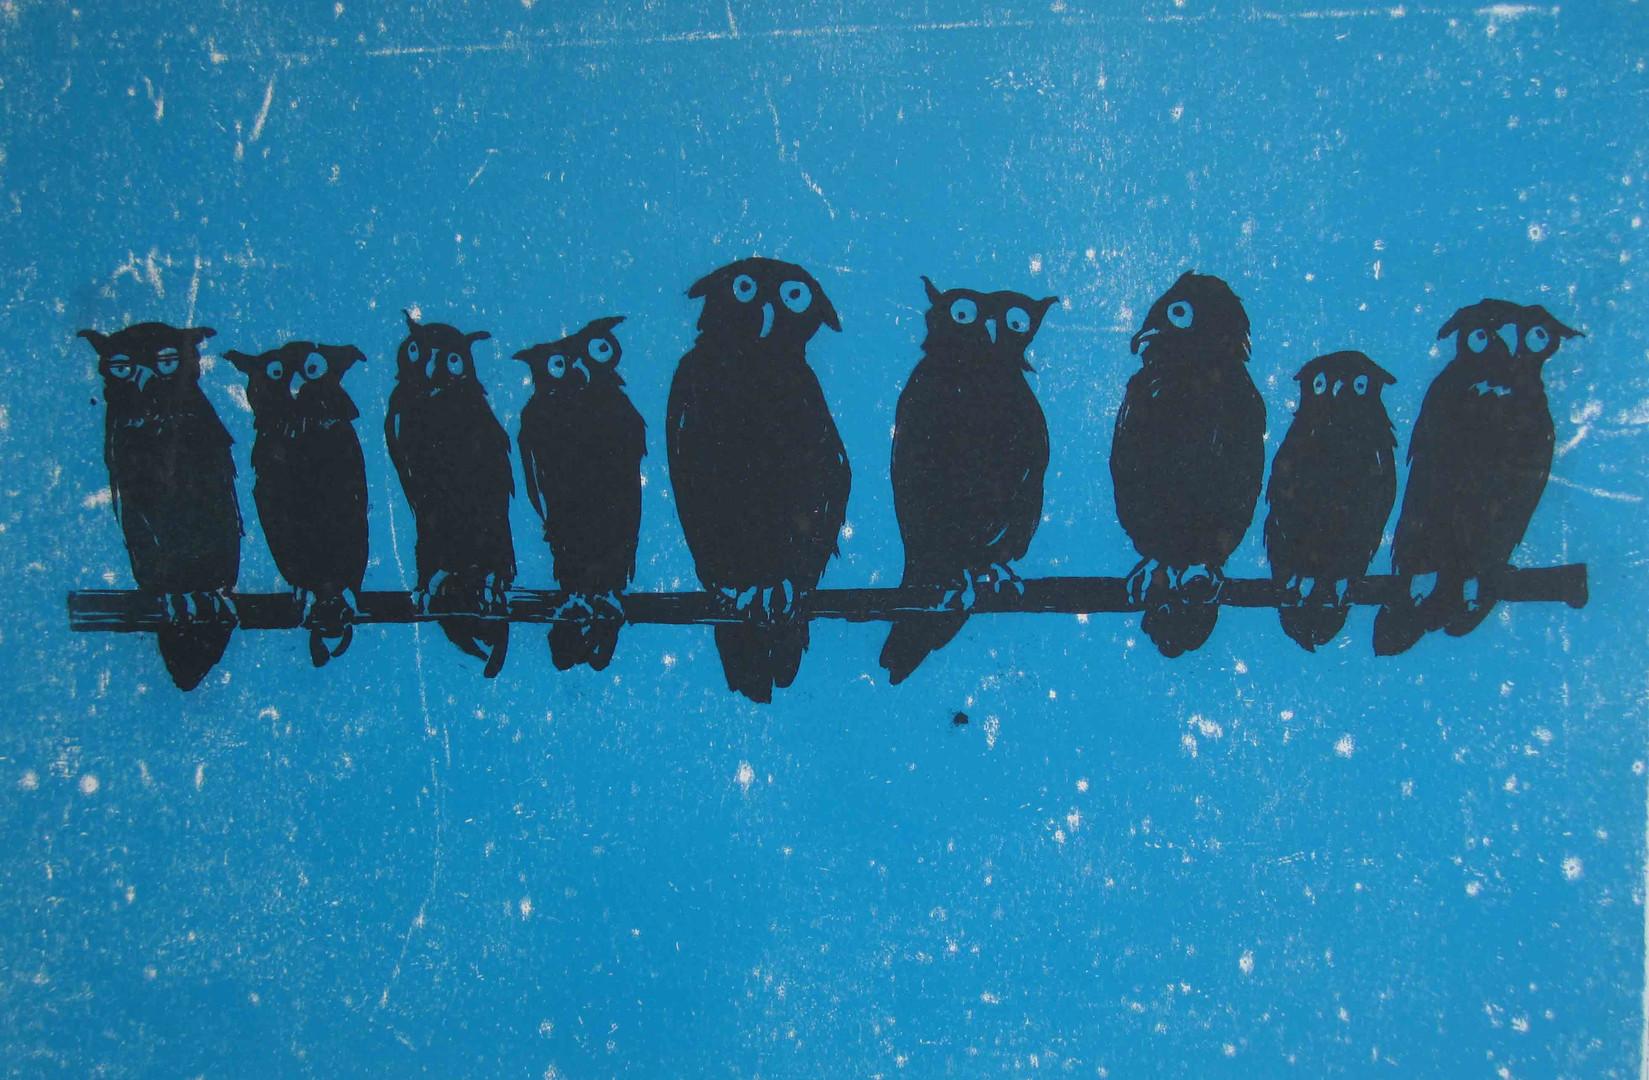 'Toowit Twoo', sugar lift printed onto blue paper,  30 x 43 cm